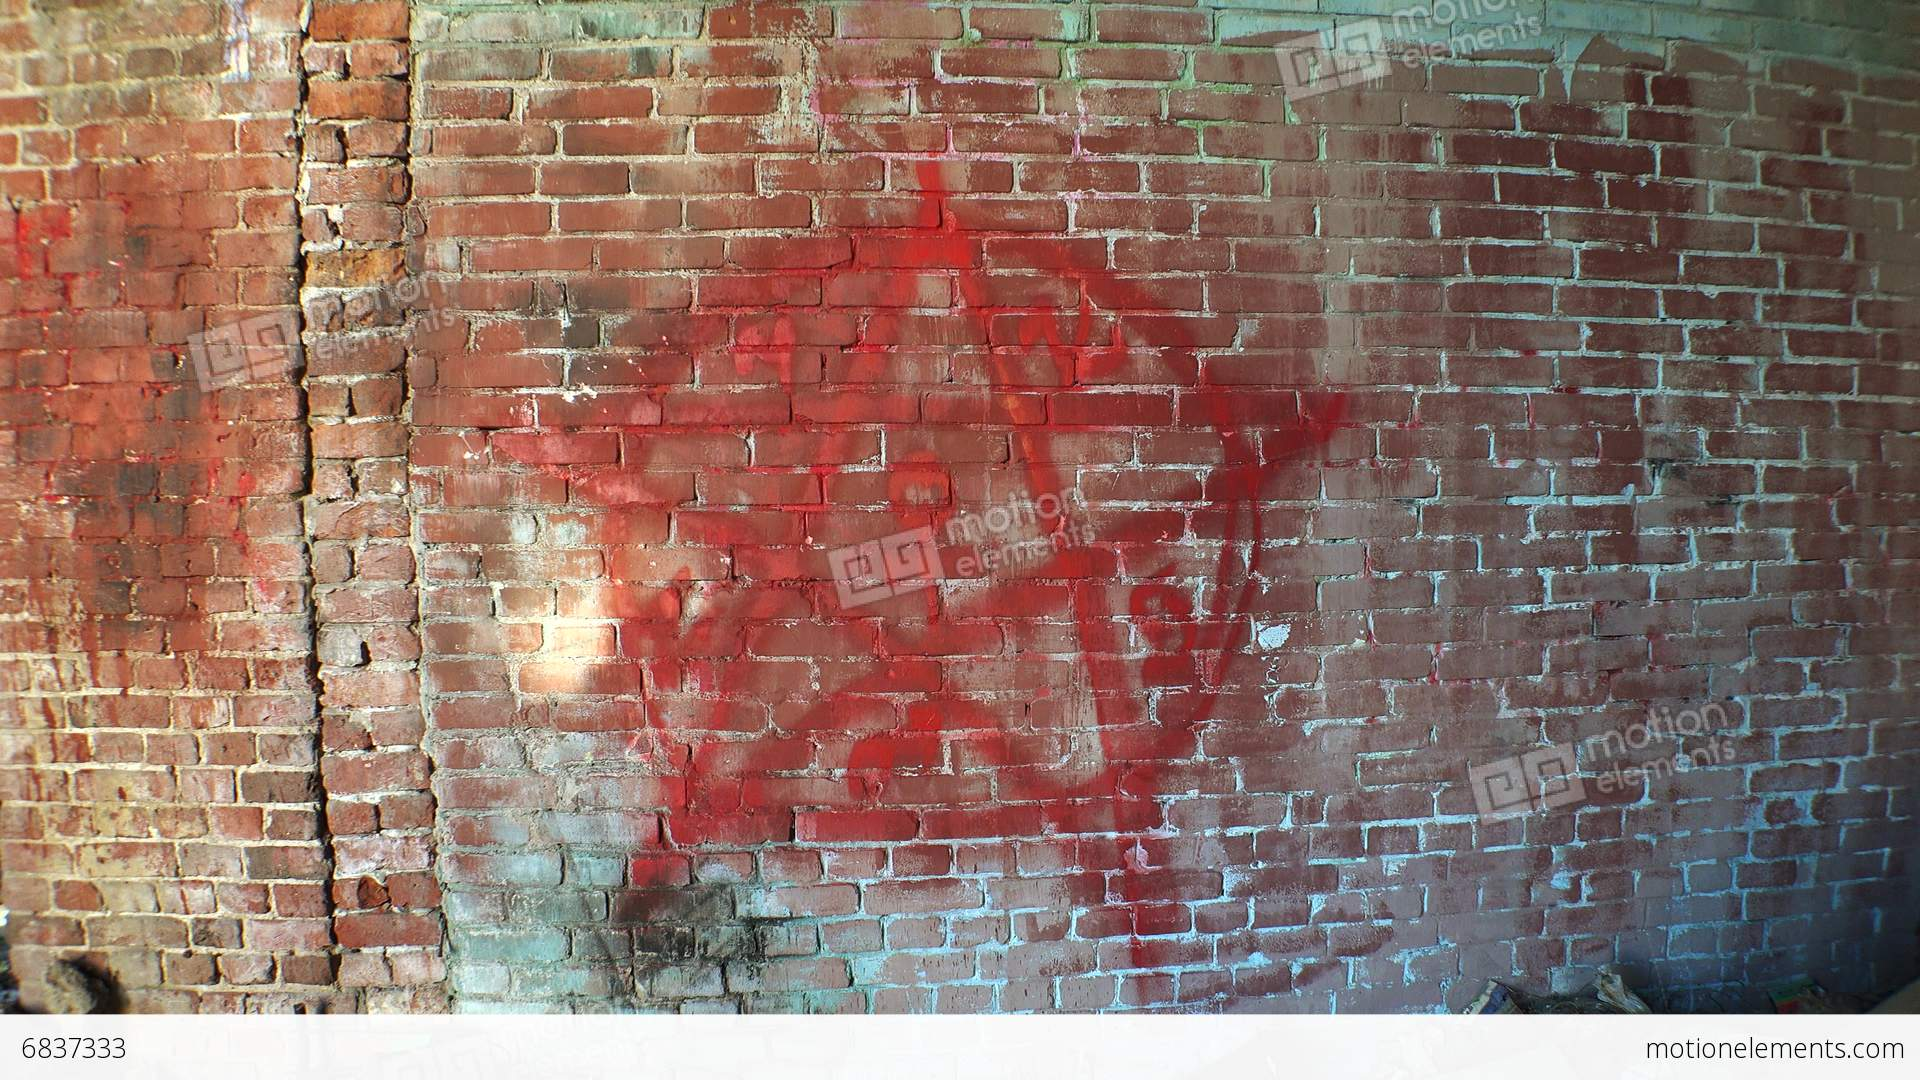 Pentagram Symbol Of Satan On A Brick Wall 4k Stock Video Footage